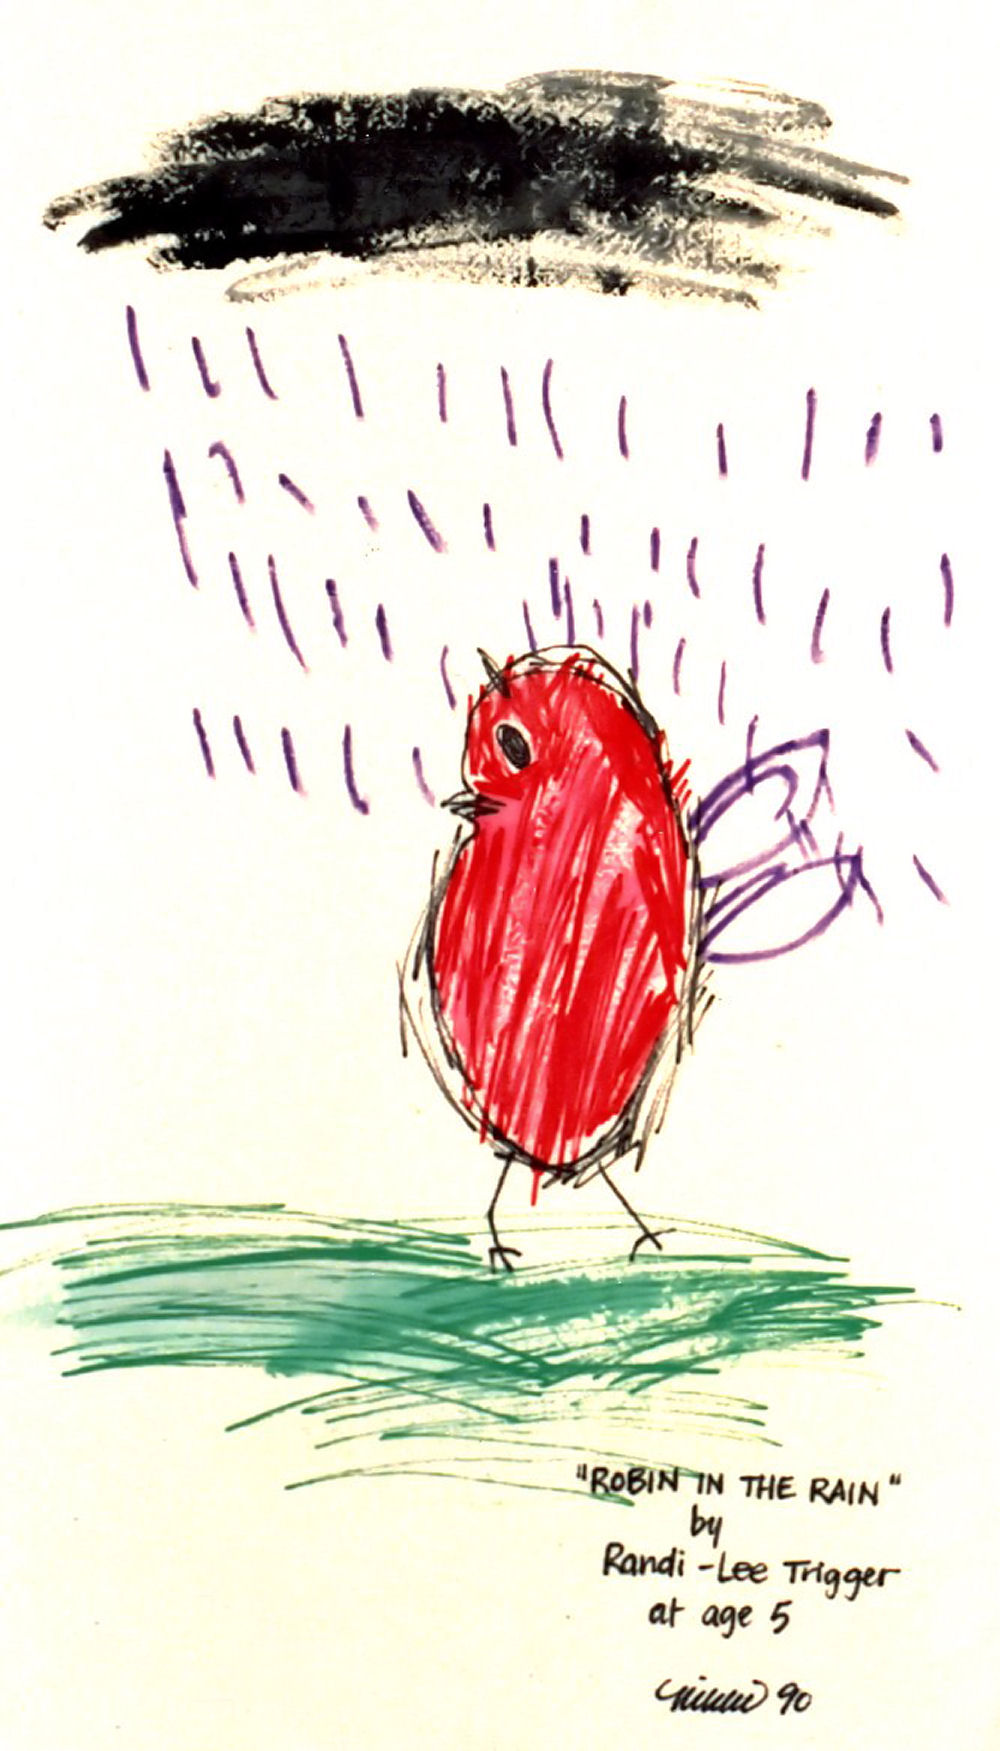 Robin in the Rain by Randi Lee, age 5 - a popular Earthbag design